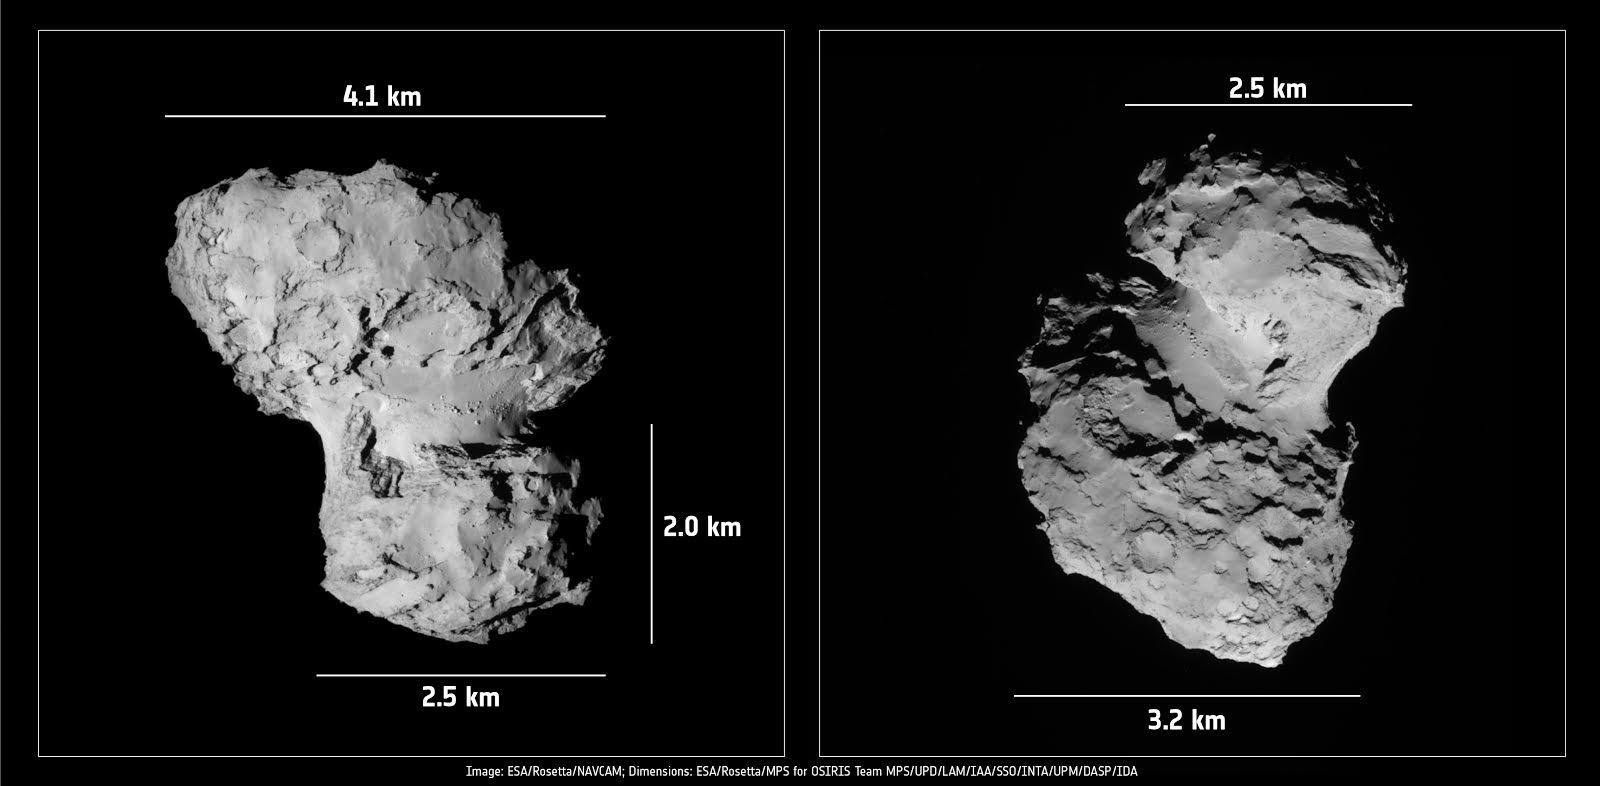 Rosetta  Space Science  Our Activities  ESA